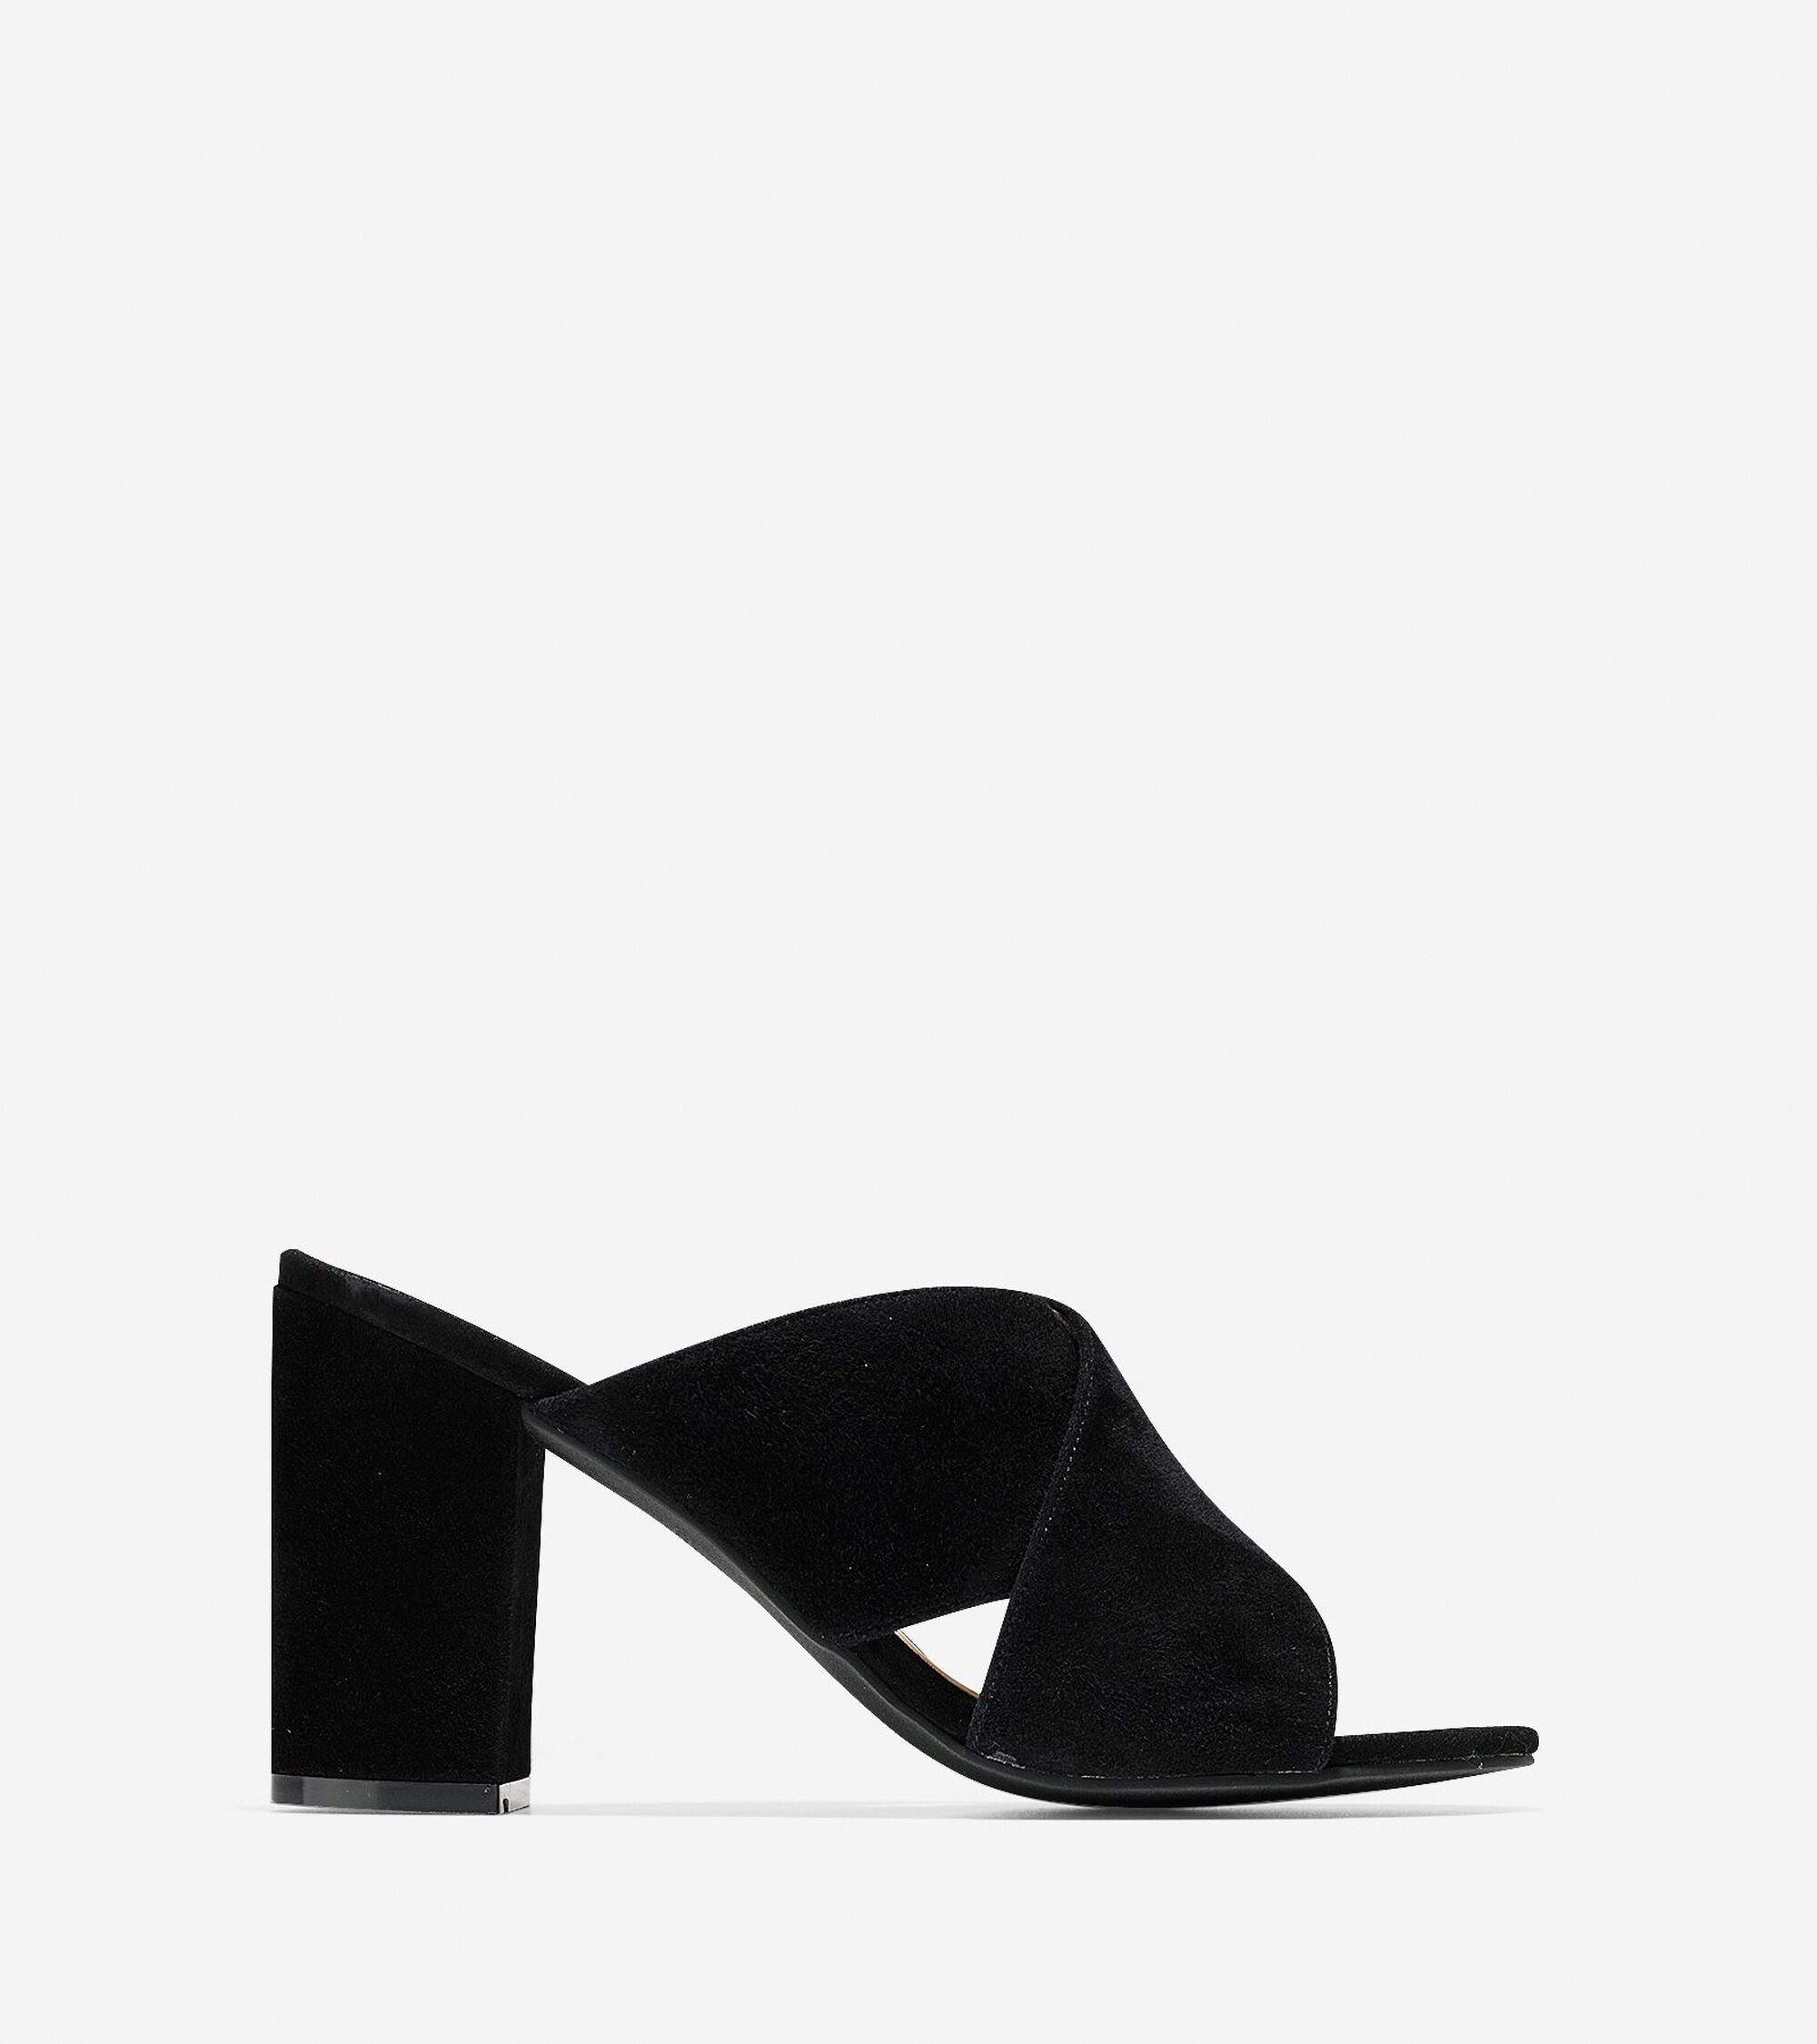 cc908123209 Women s Gabby Sandals (85mm) in Black Suede